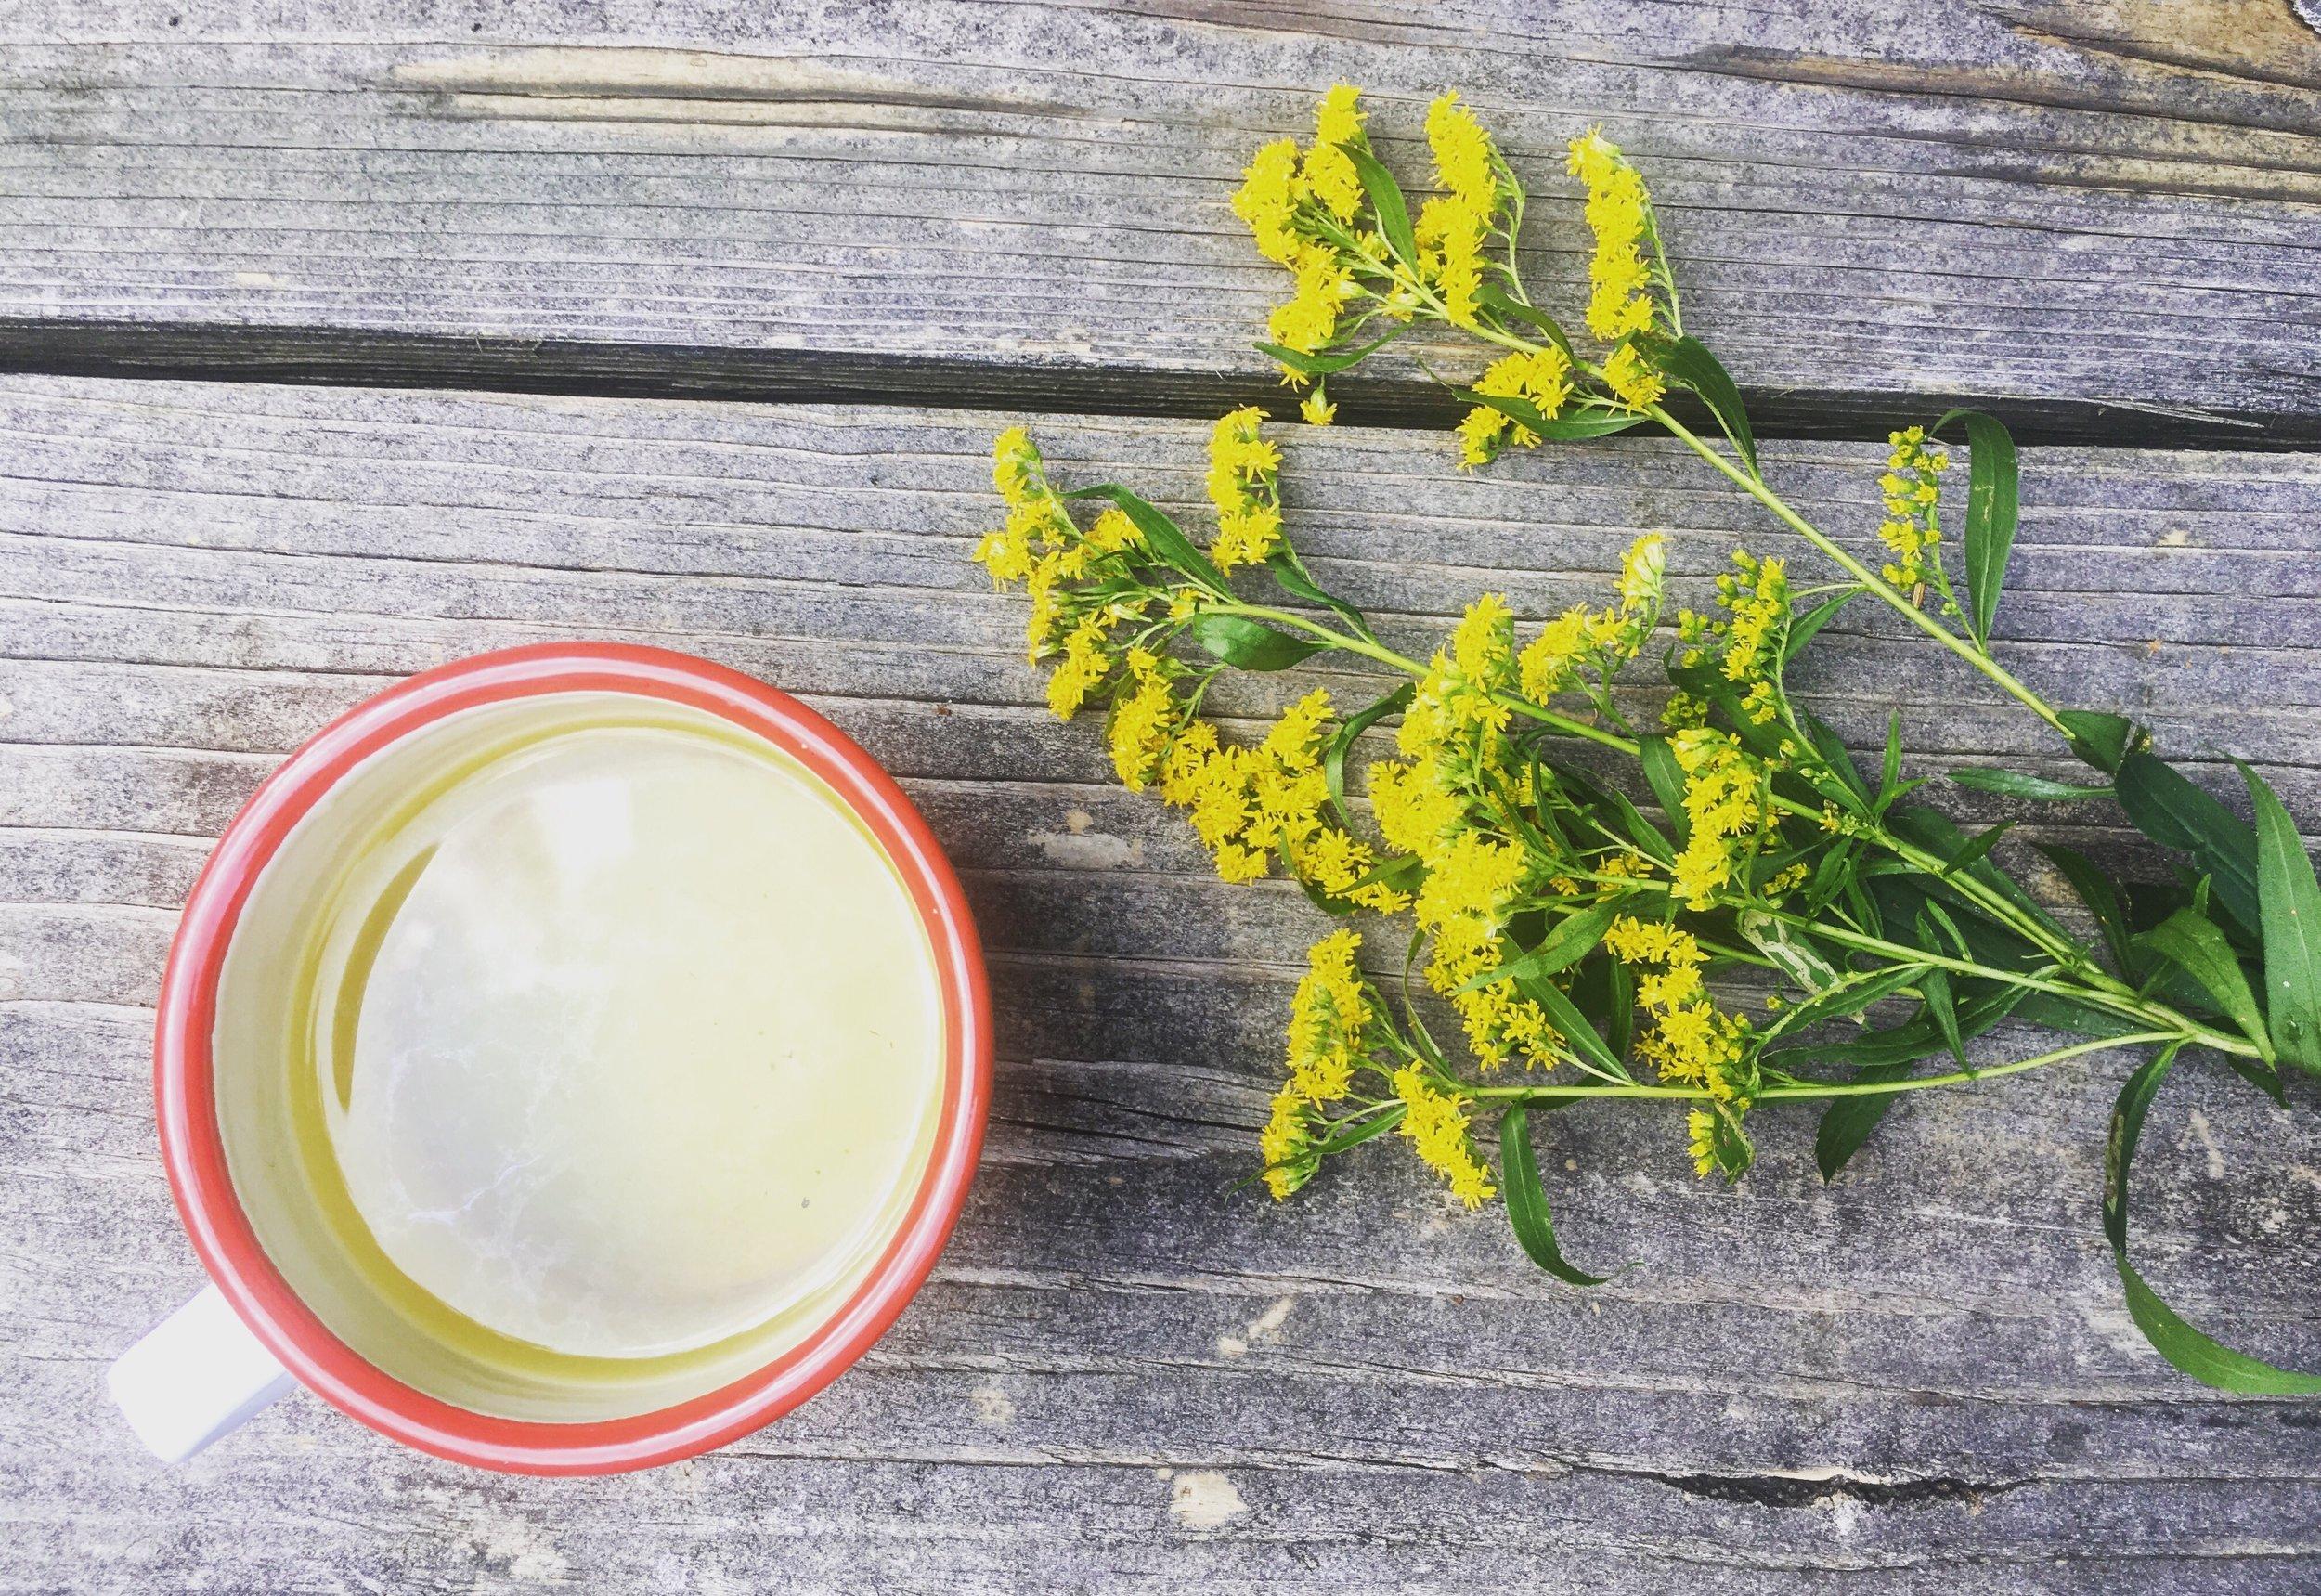 Foraged Goldenrod Tea